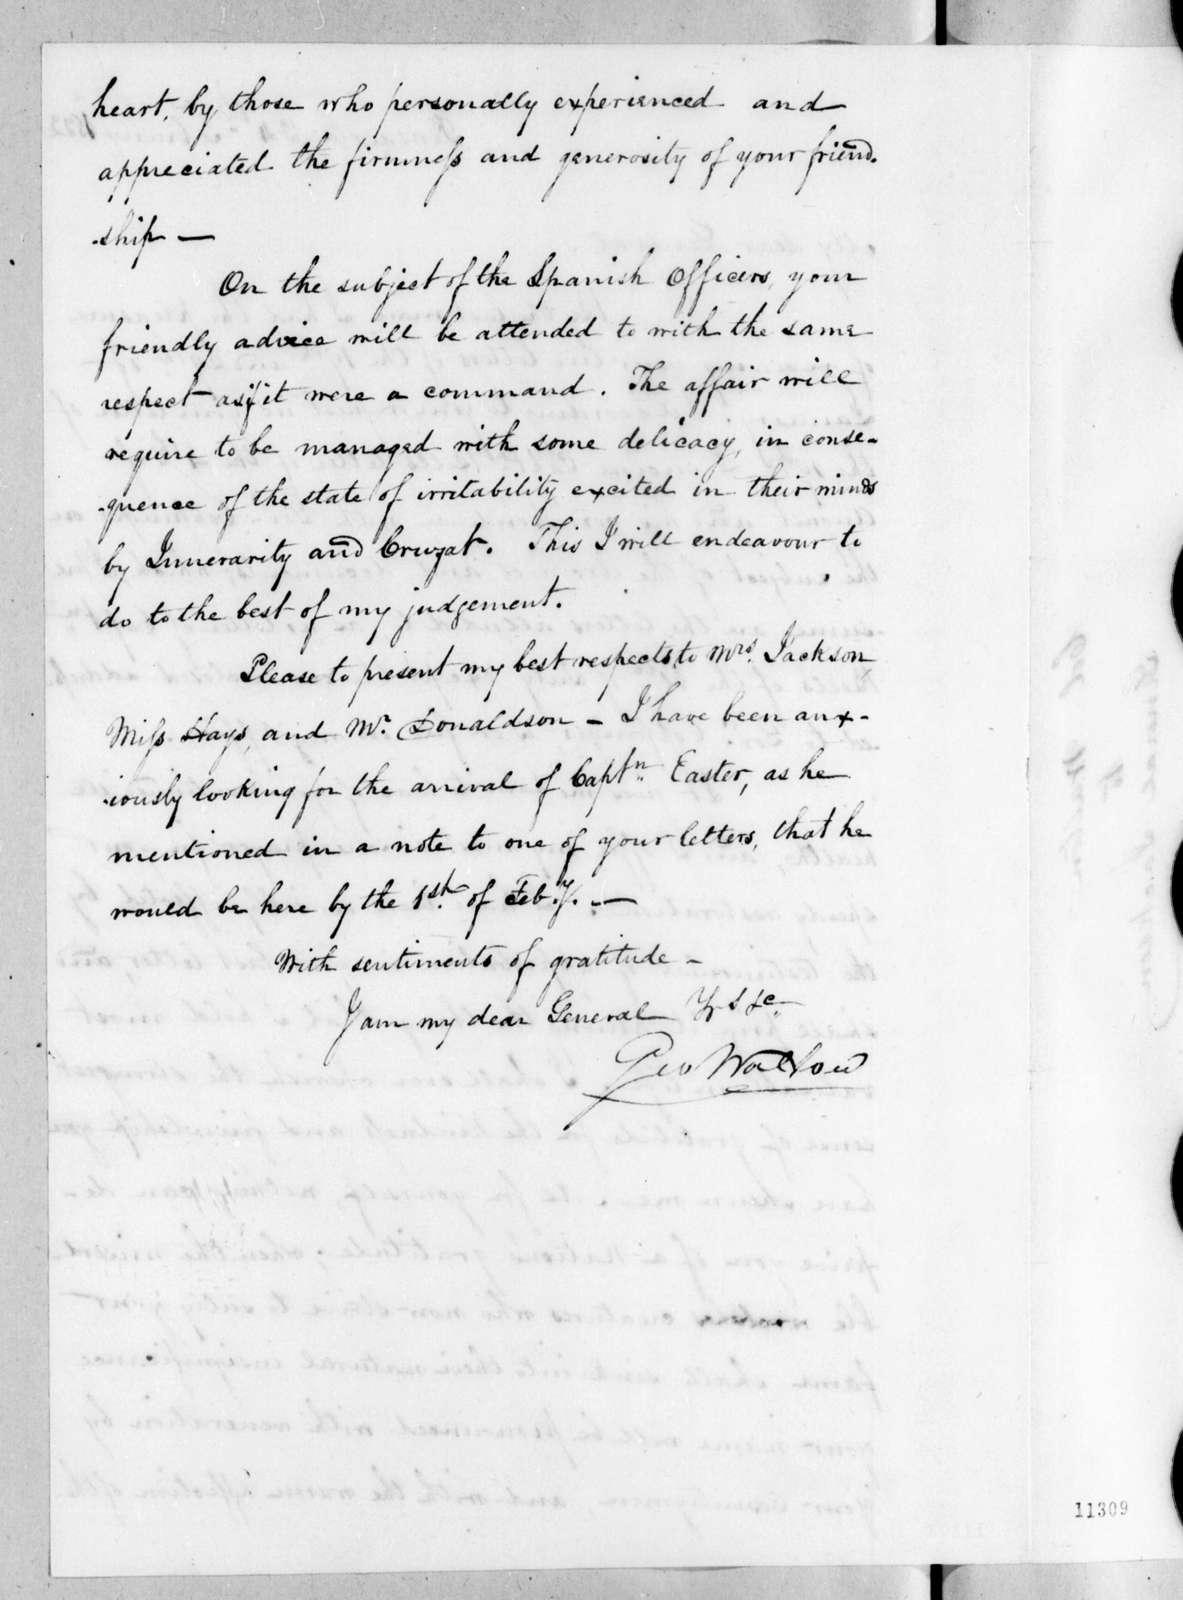 George Walton to Andrew Jackson, February 24, 1822